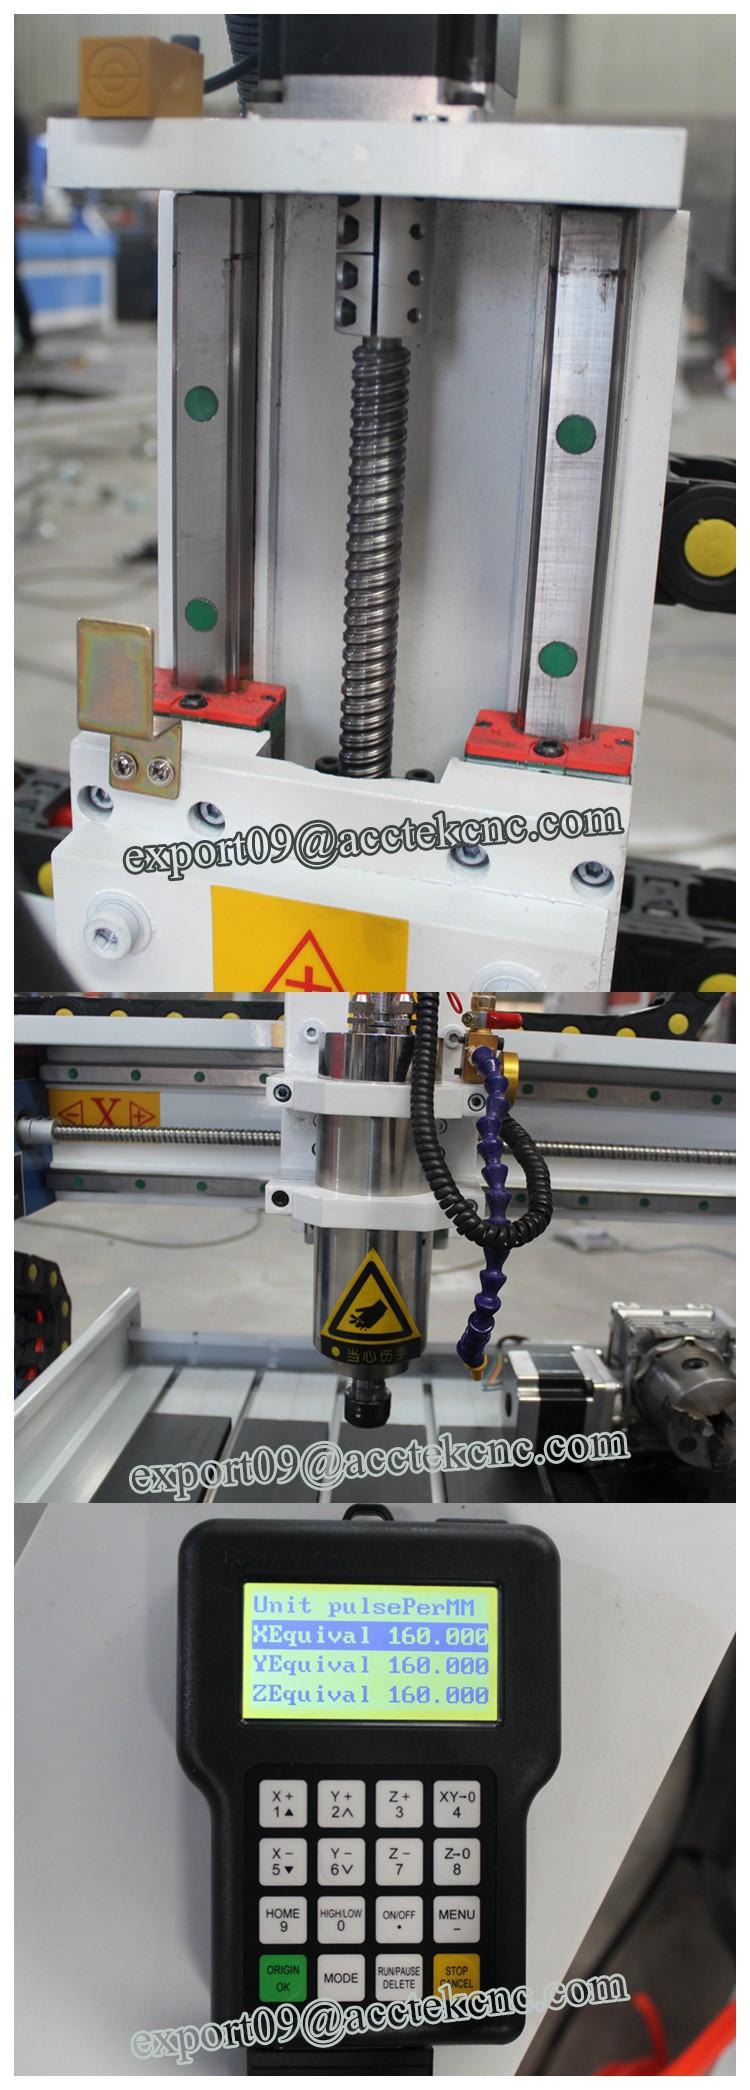 German Woodworking Machinery Manufacturers - Buy German Woodworking ...